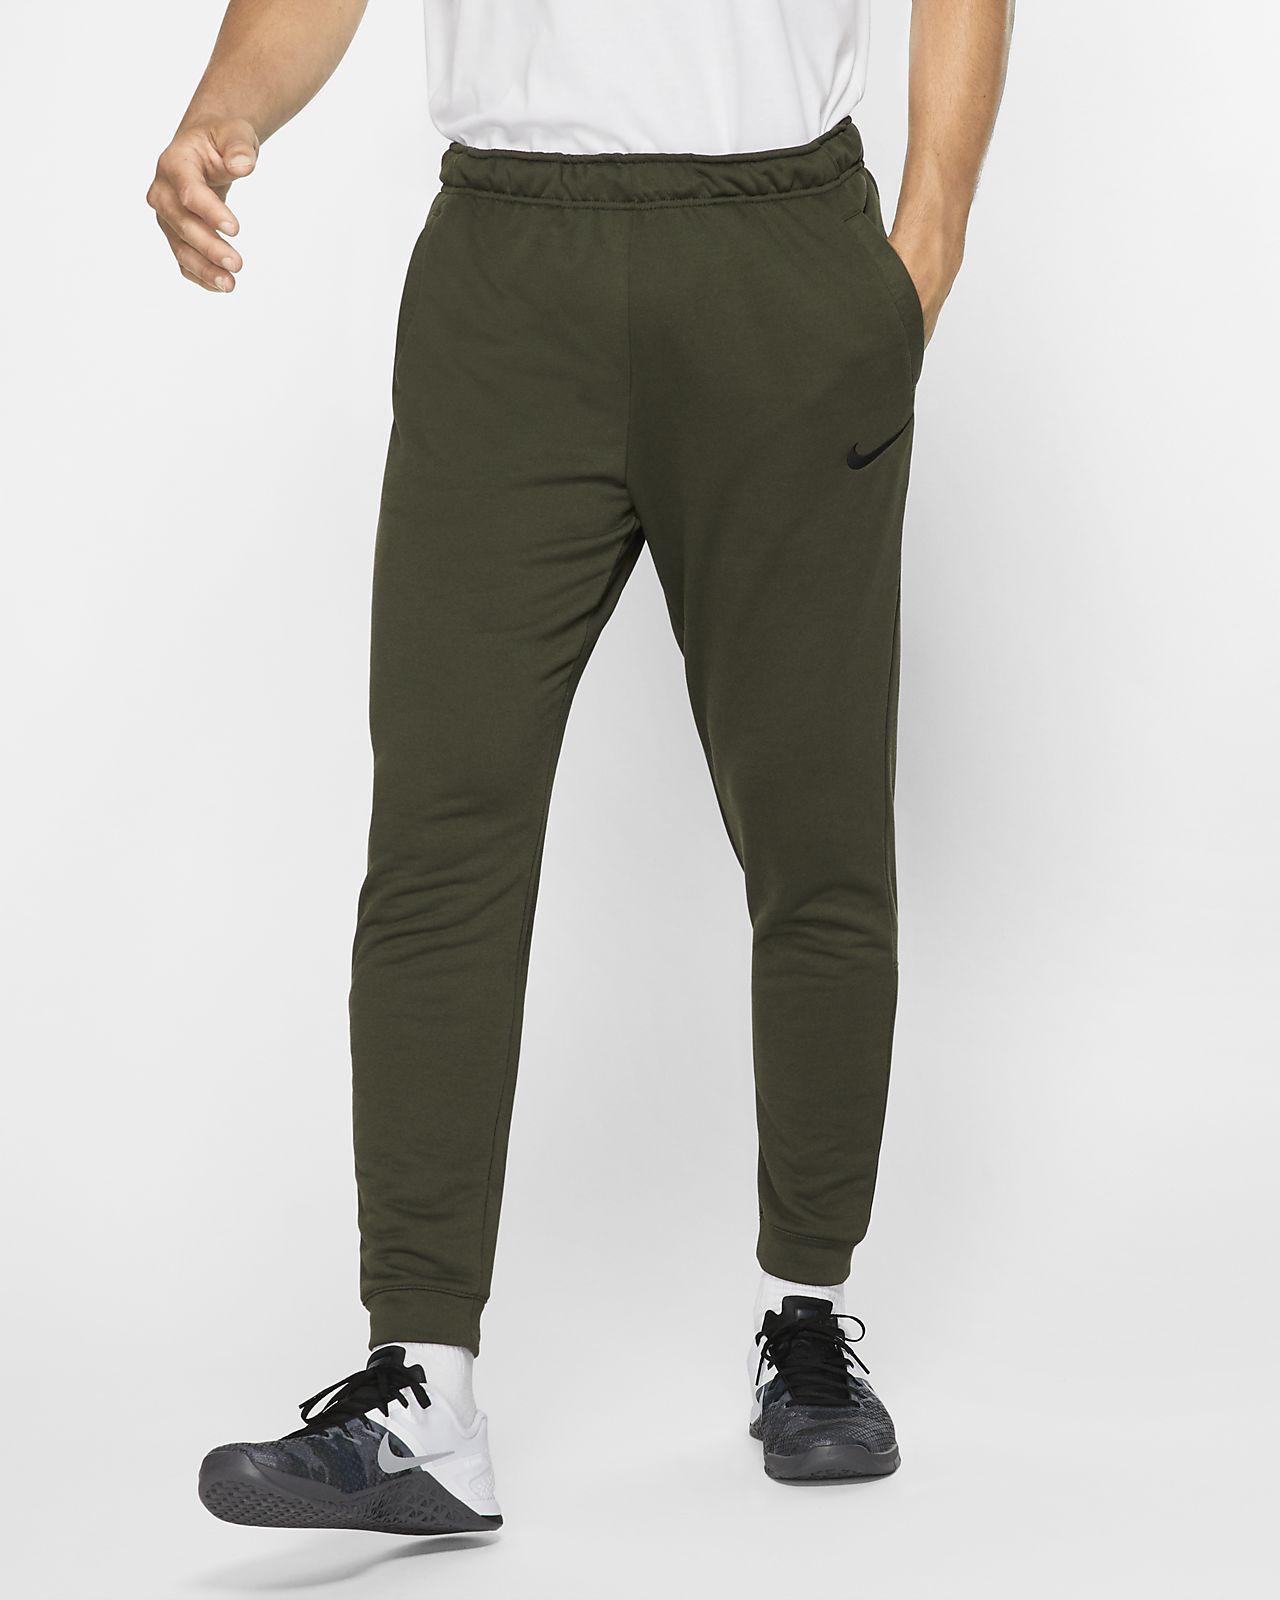 Nike Dri-FIT Men's Tapered Fleece Training Pants